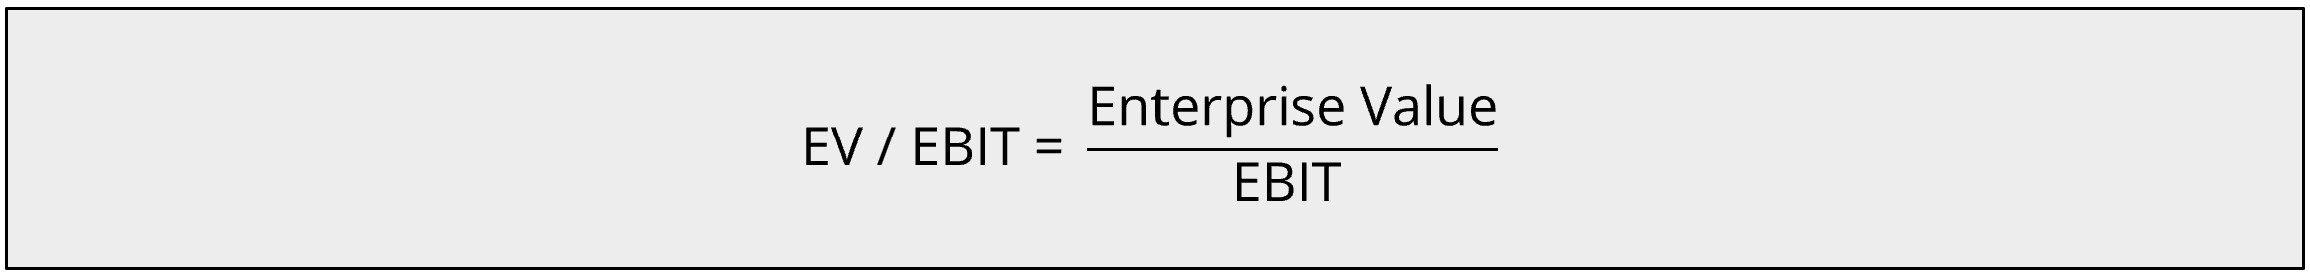 EV / EBIT Formula